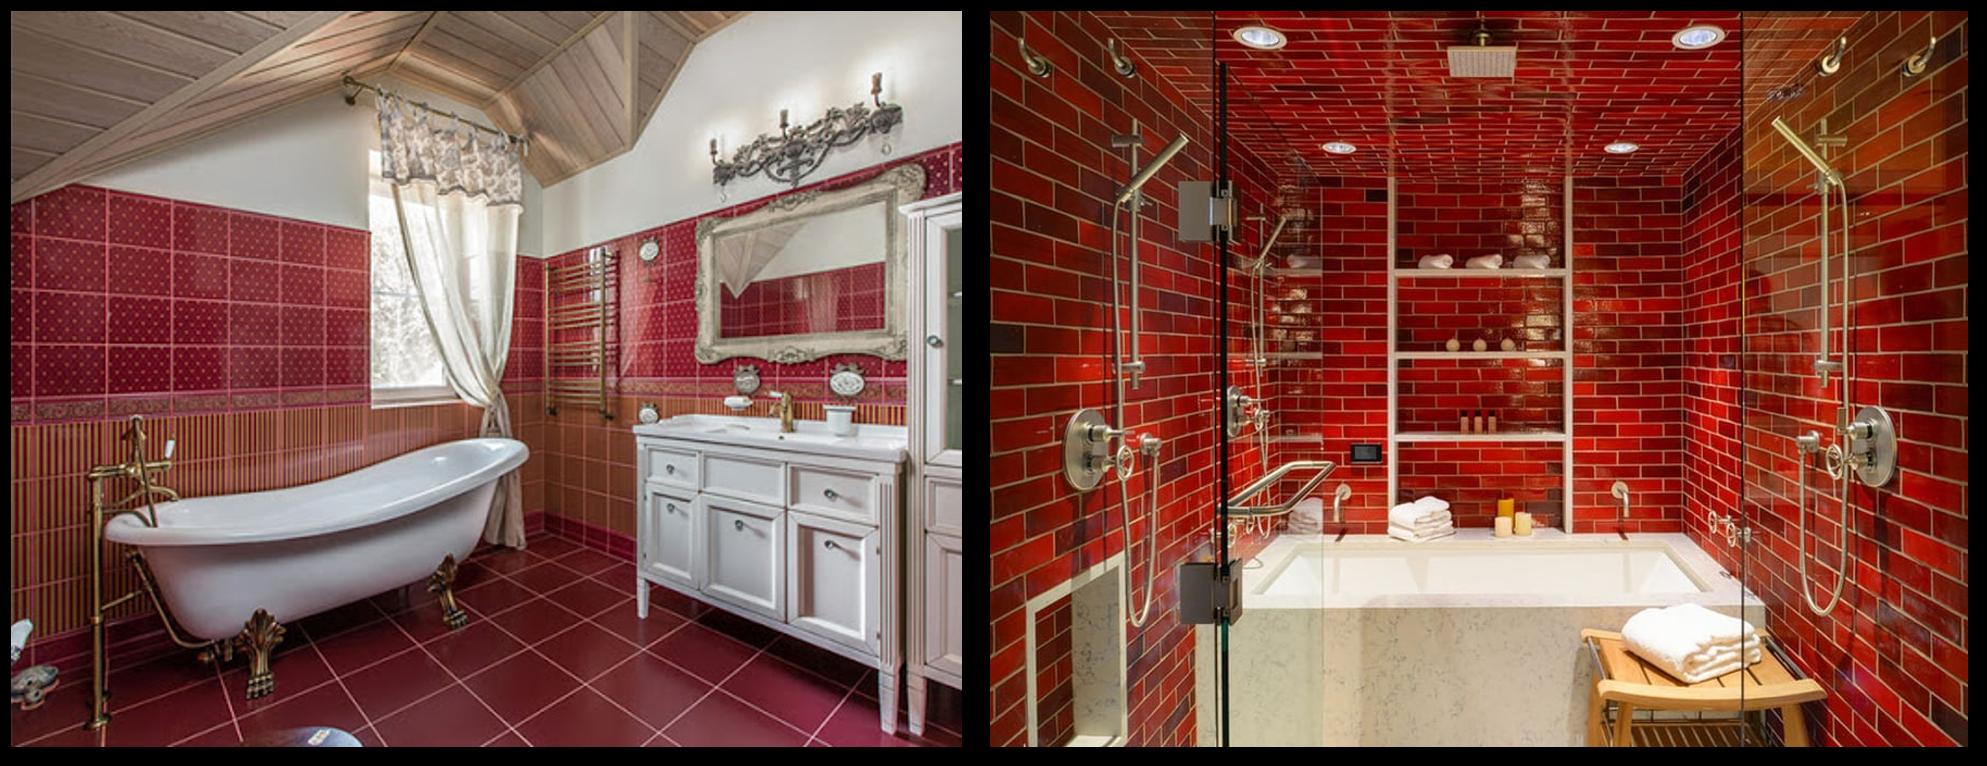 سرویس بهداشتی قرمز